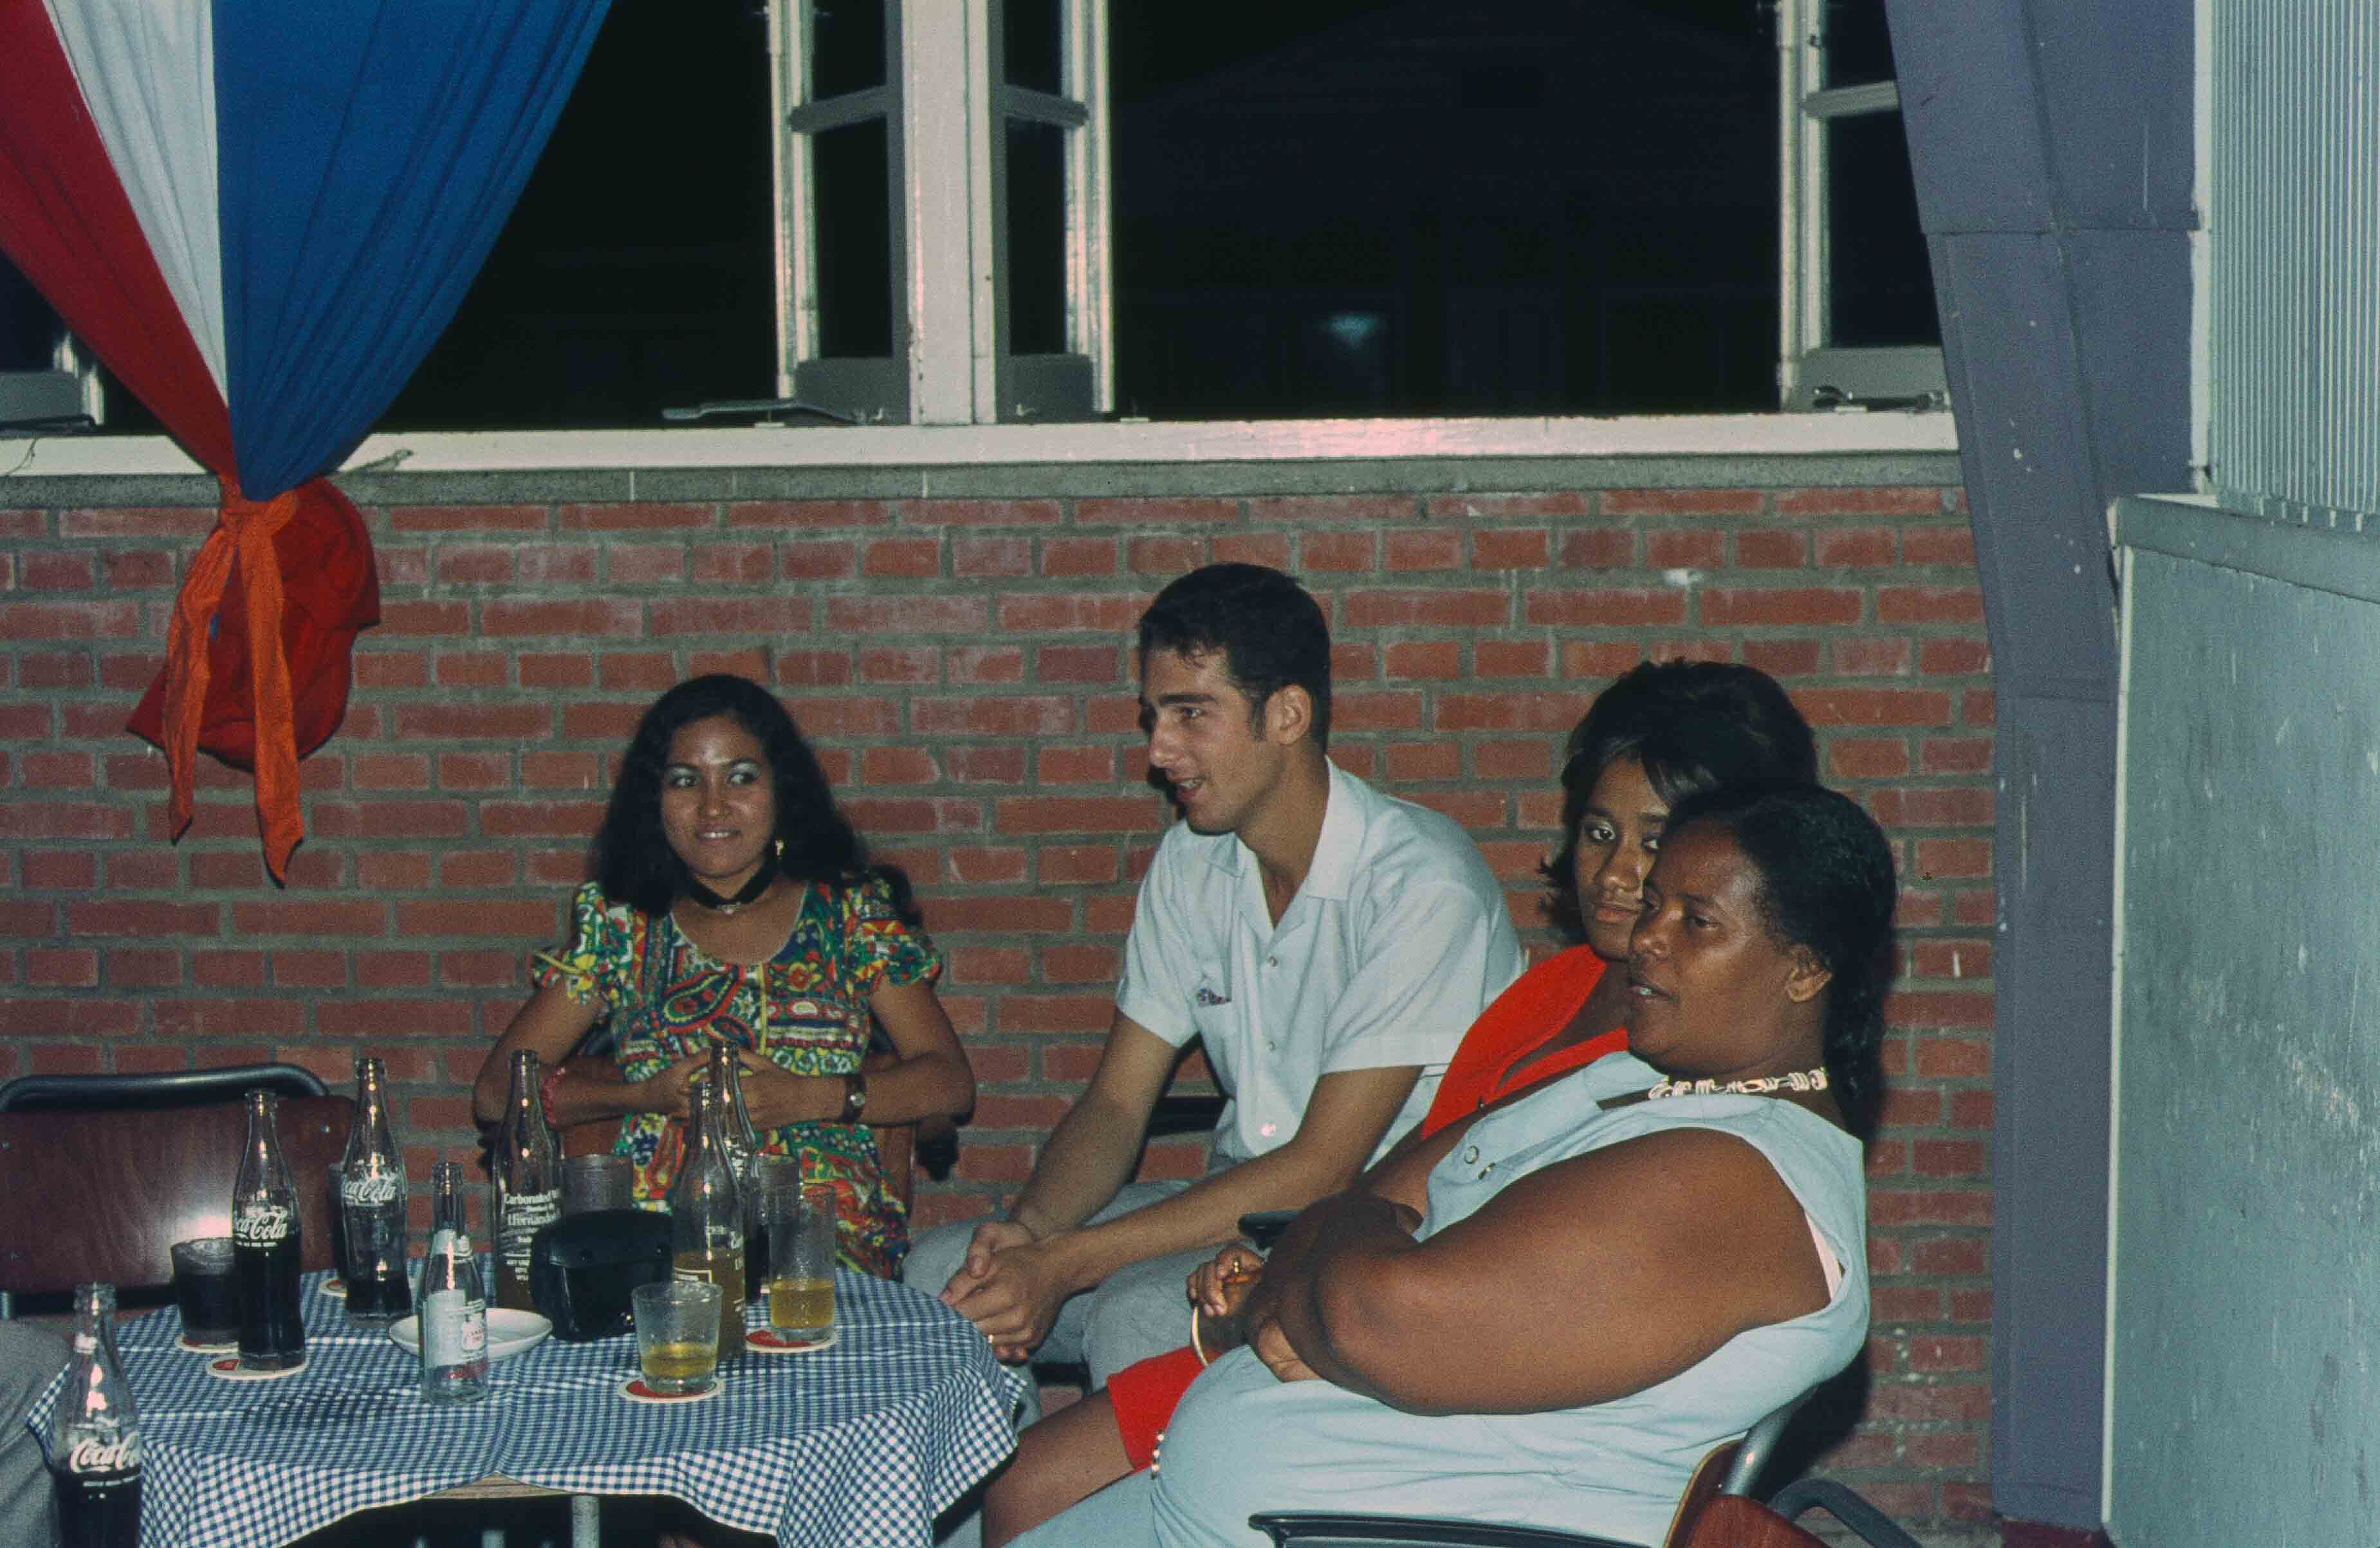 305. Suriname